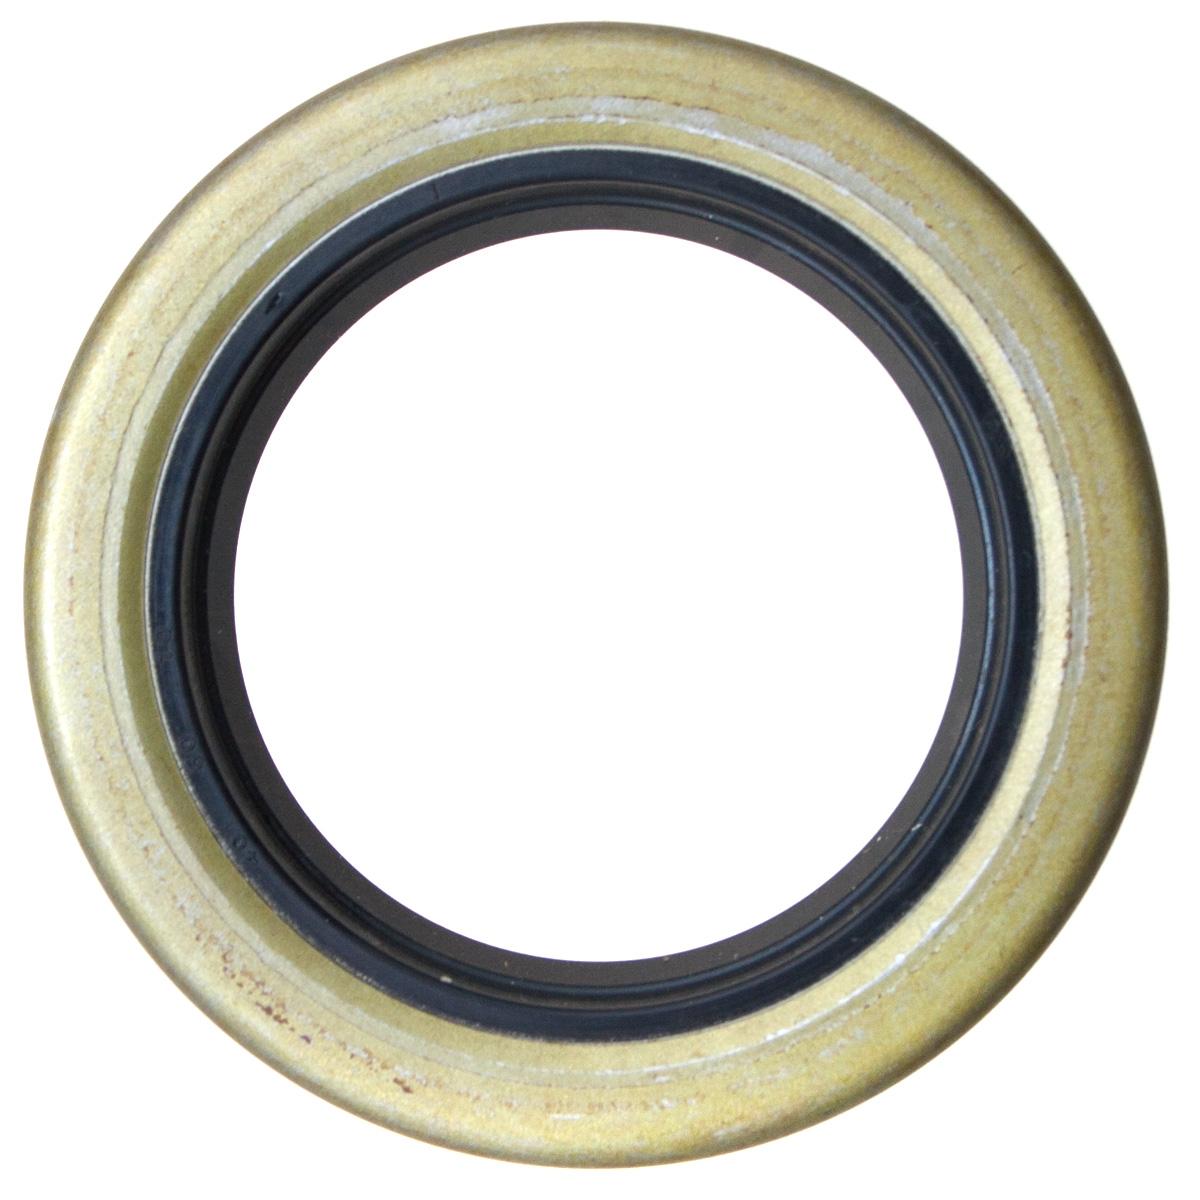 25 Radial-Wellendichtringe 25 x 52 x 10 mm DASL NBR 70 Business & Industrie